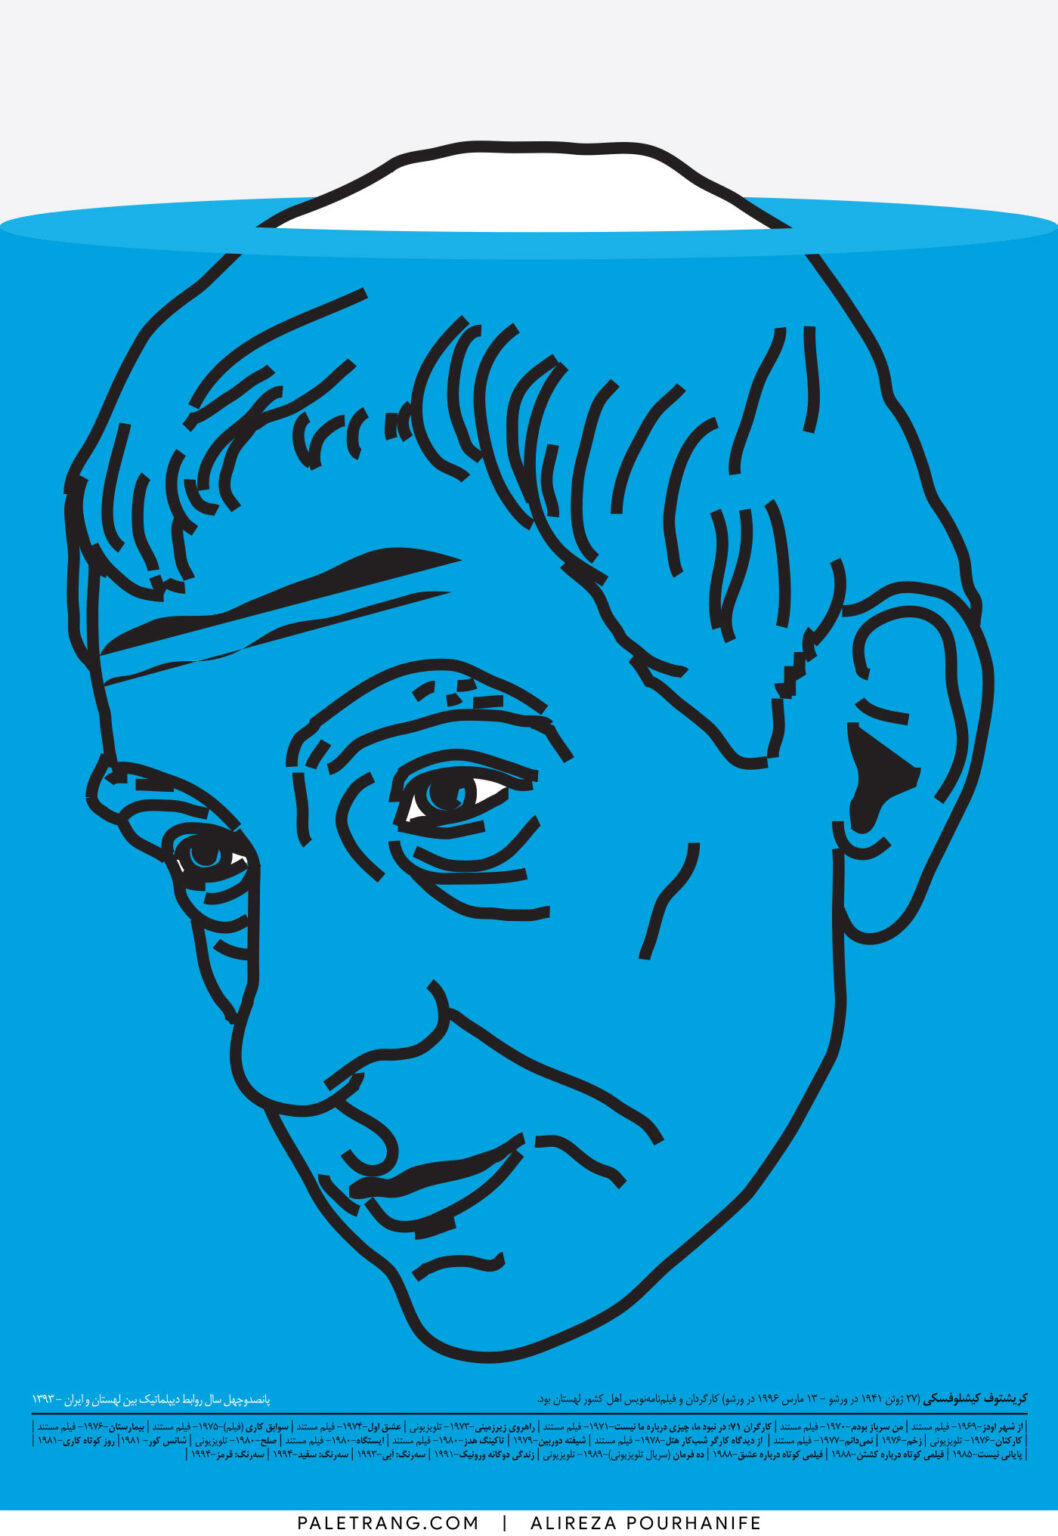 پوستر هفته فرهنگی ایران و لهستان-کیشلوفسکی اثر علیرضا پورحنیفه